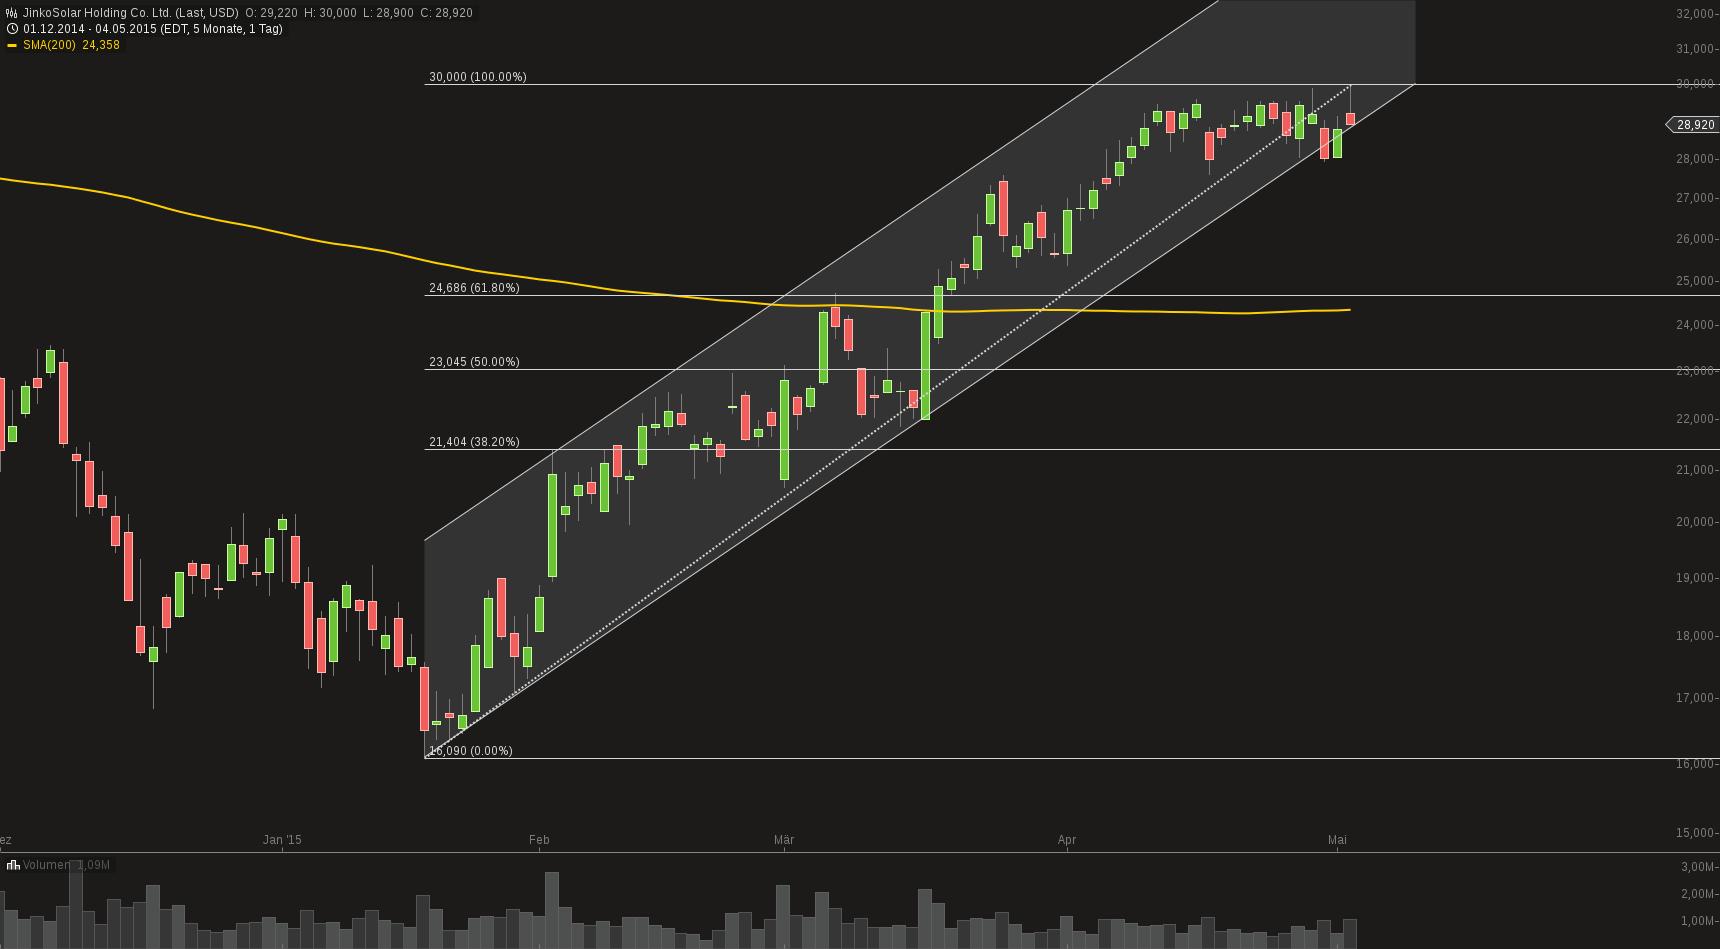 chart-05052015-0933-jinkosolar_holding_co_ltd.png